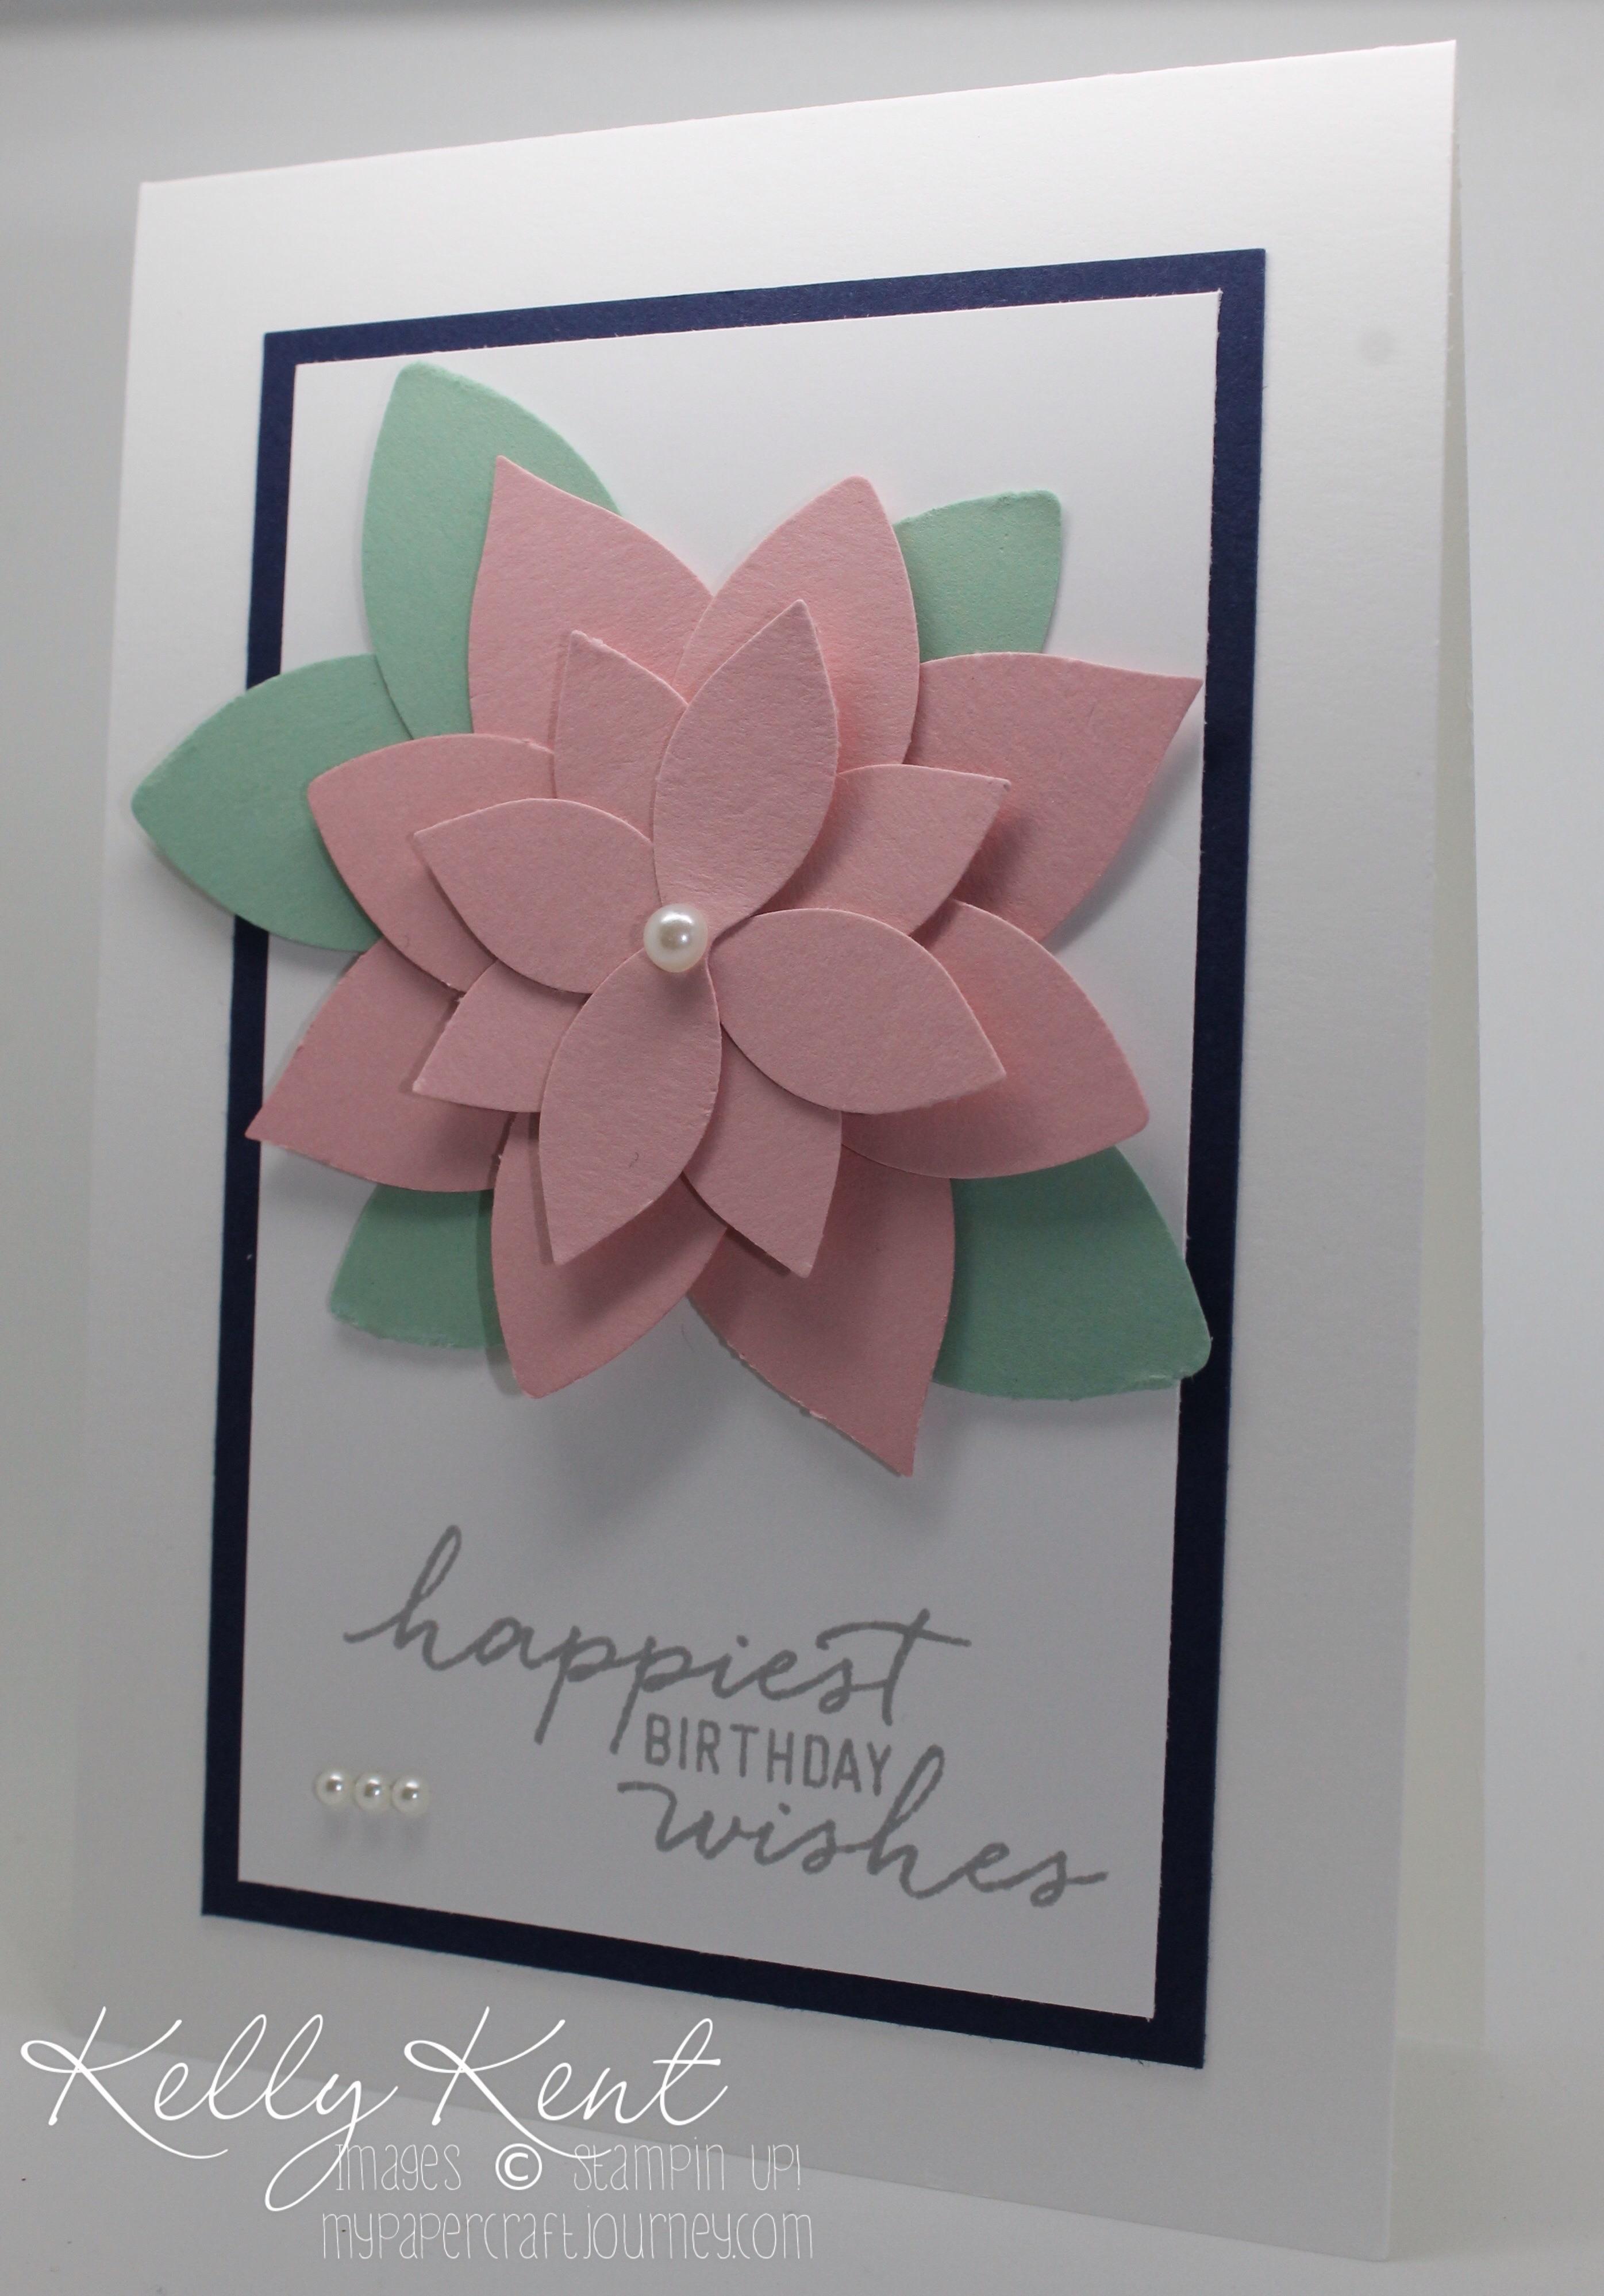 The Festive Flower Punch Jai285 Kelly Kent